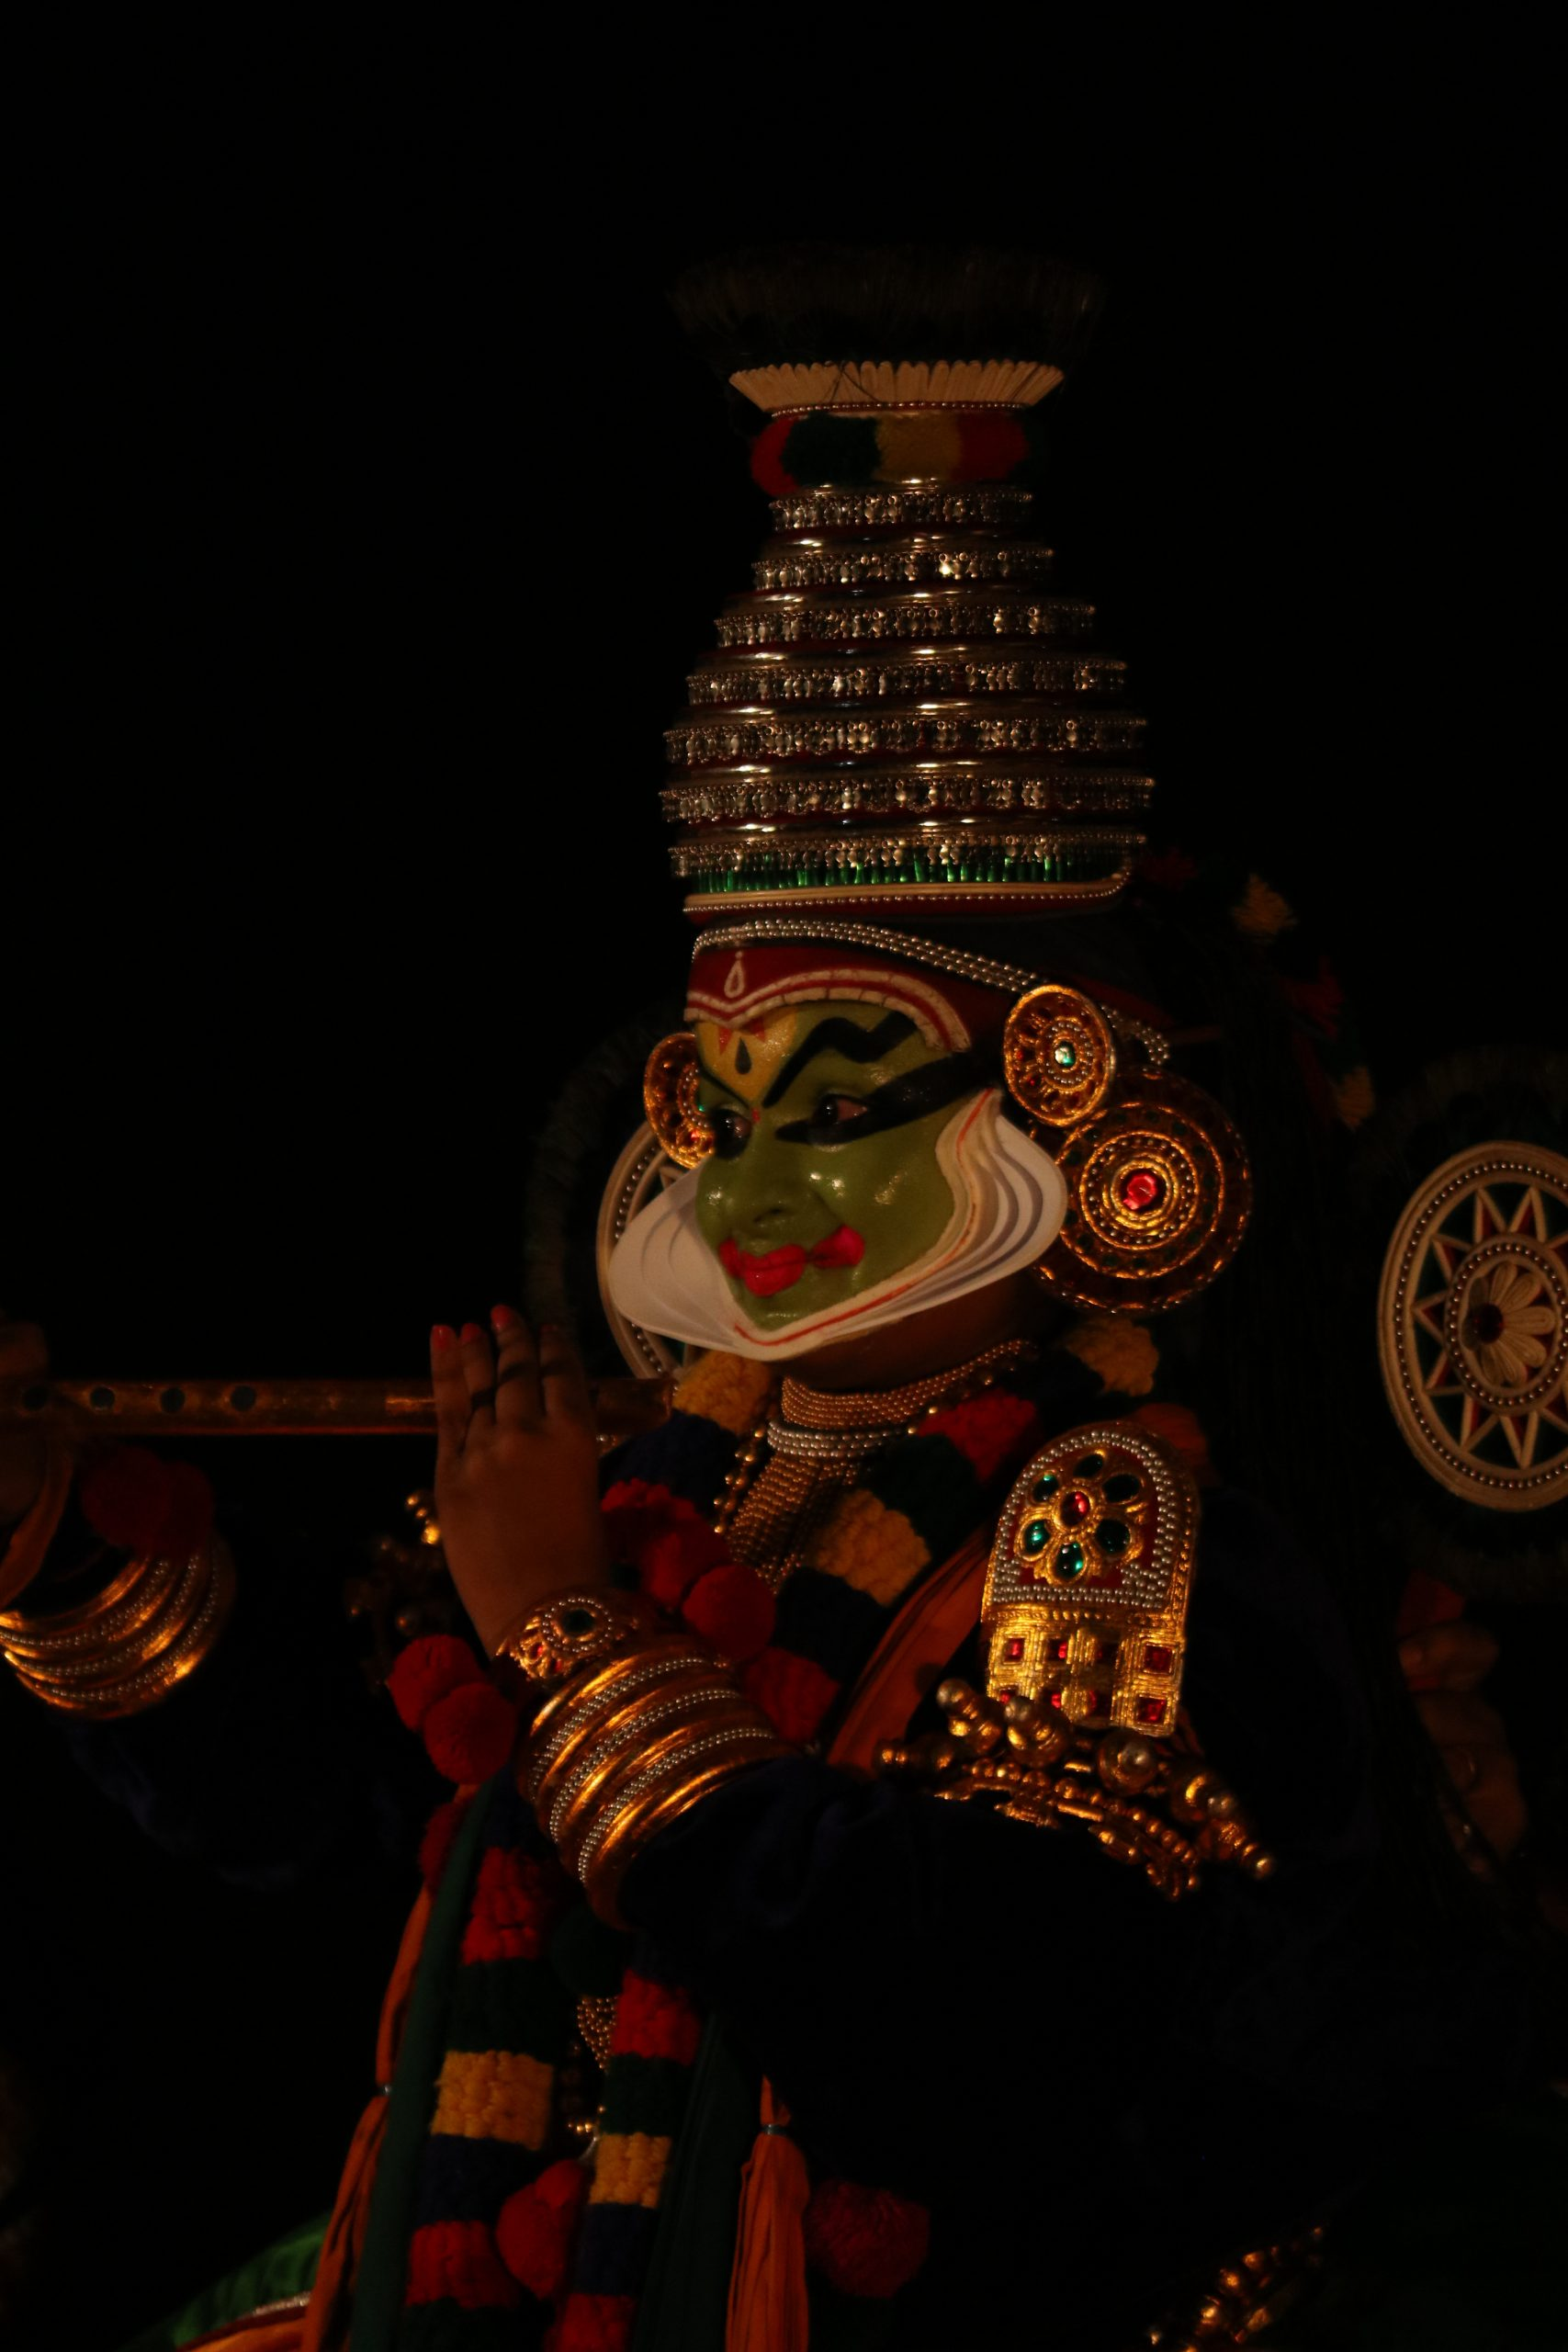 Portrait of a Kathakali dance artist